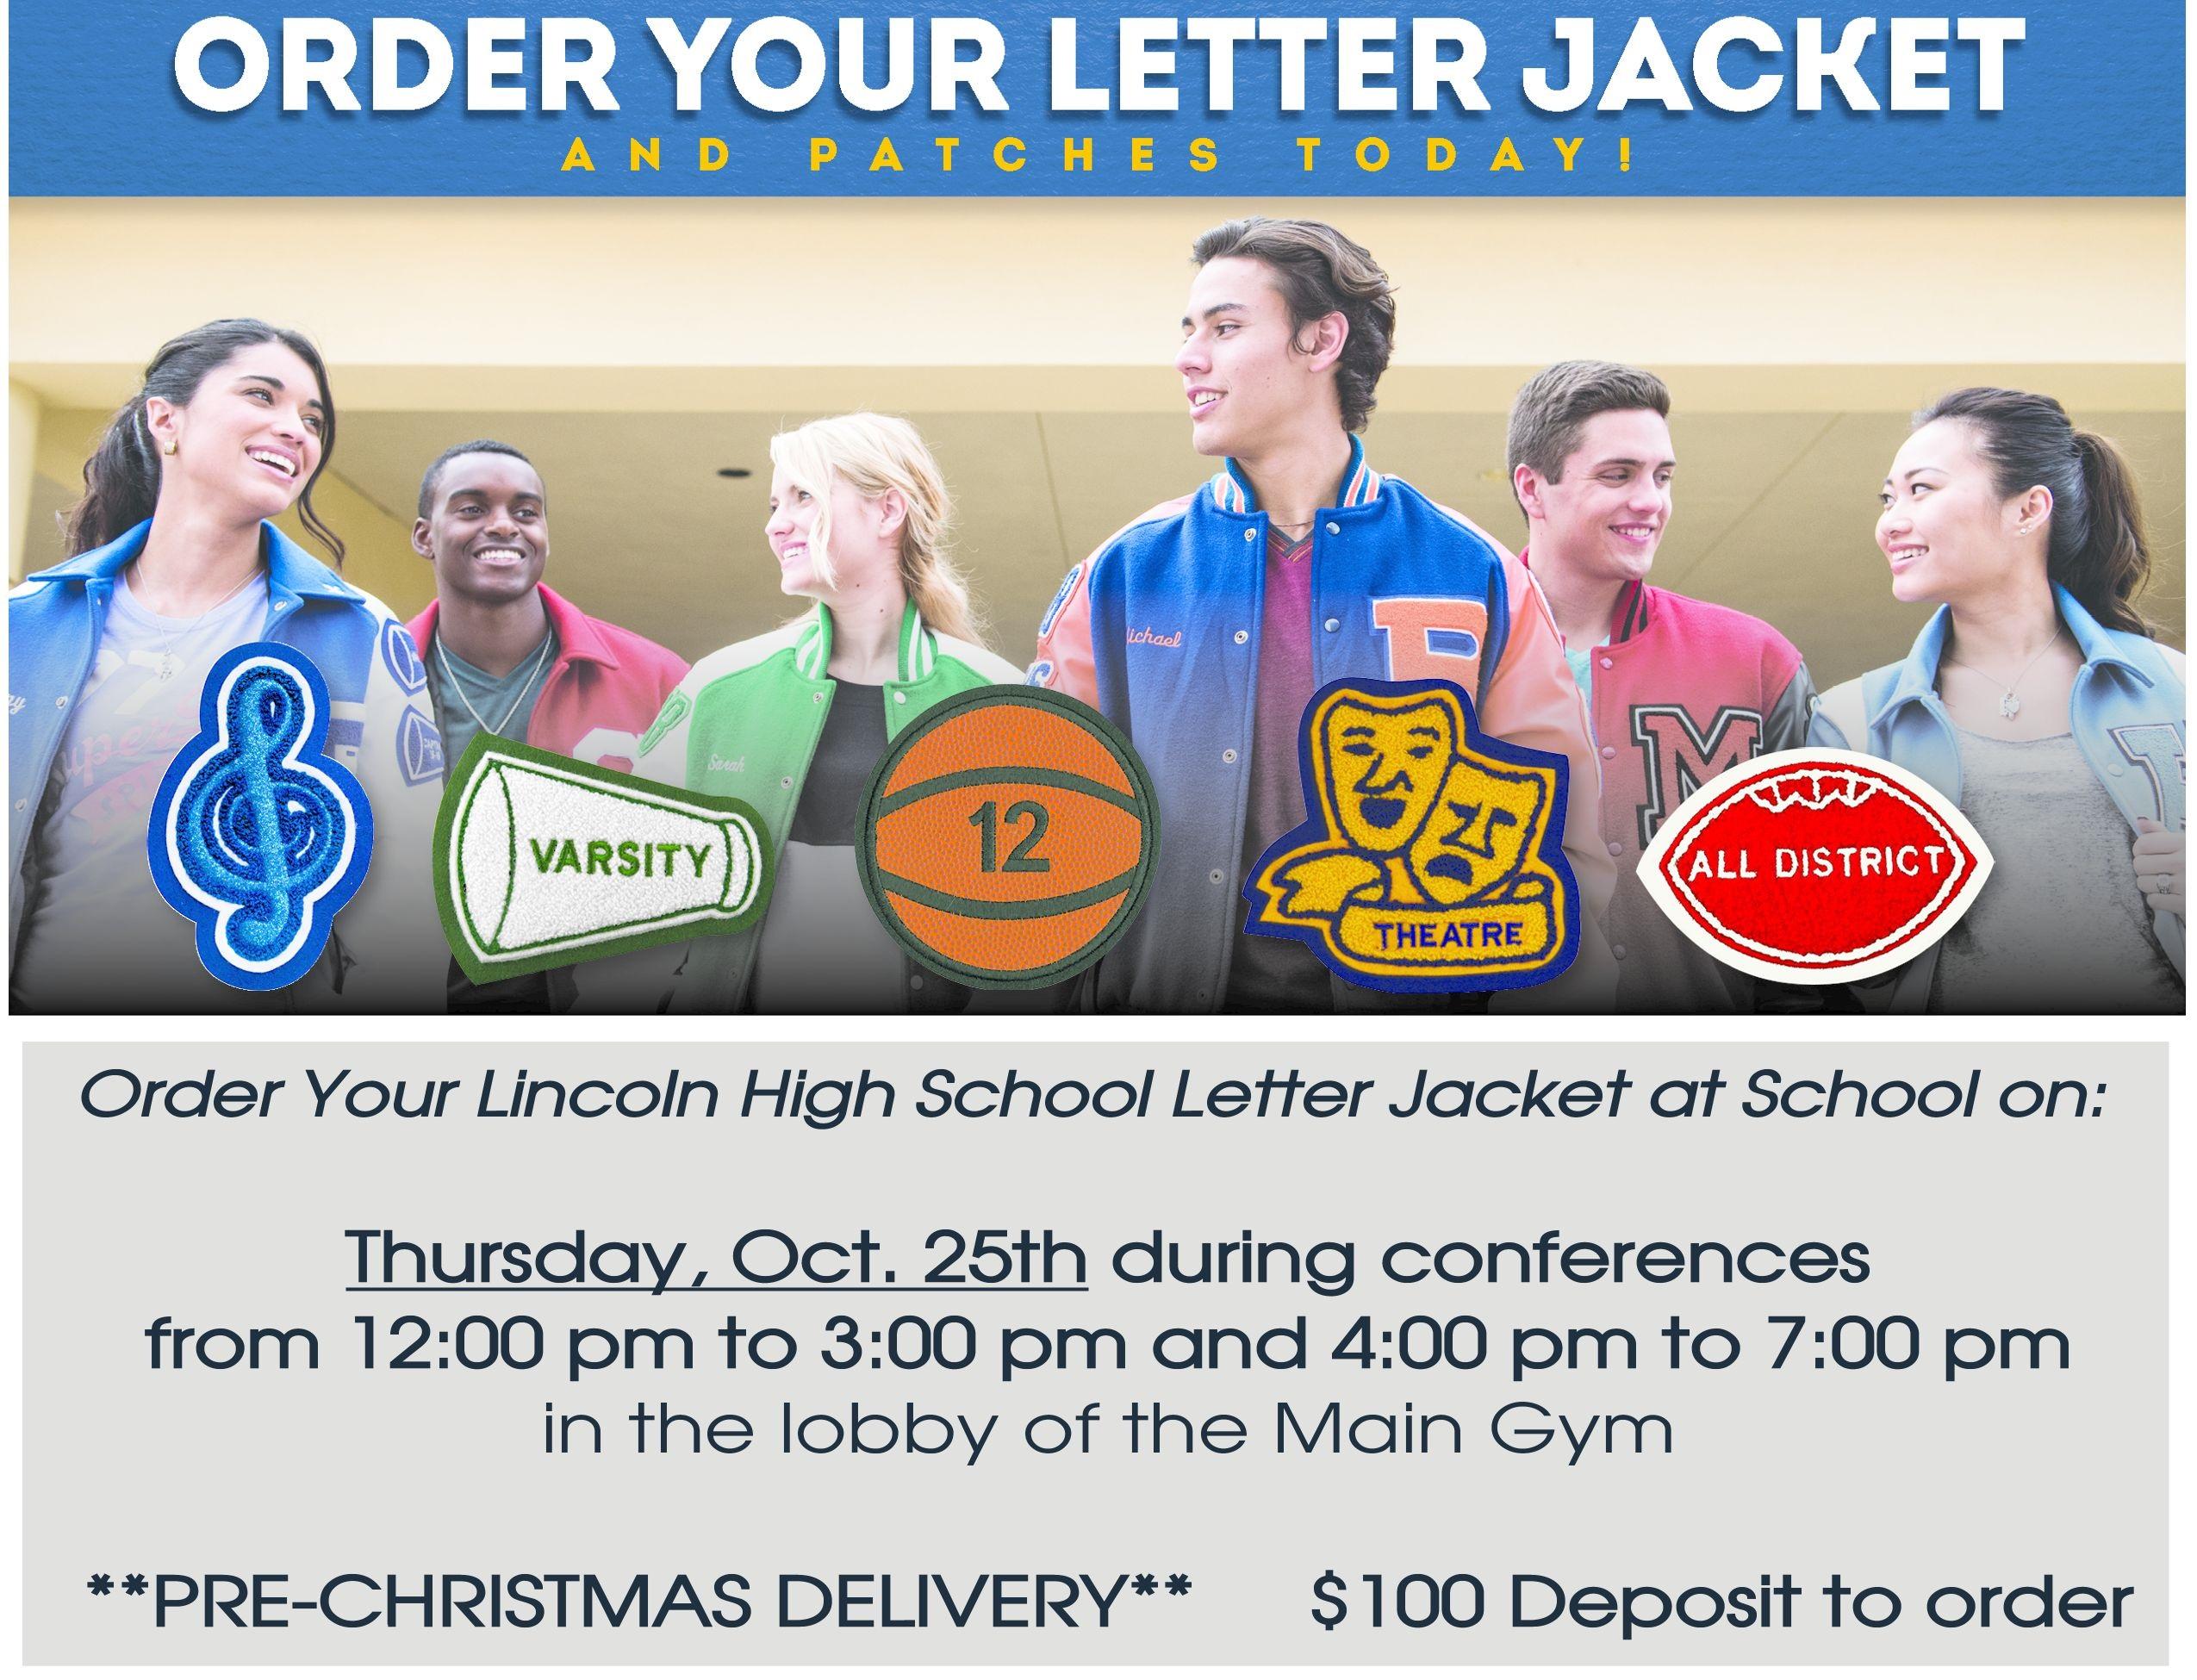 Varsity Jacket Event October 25th